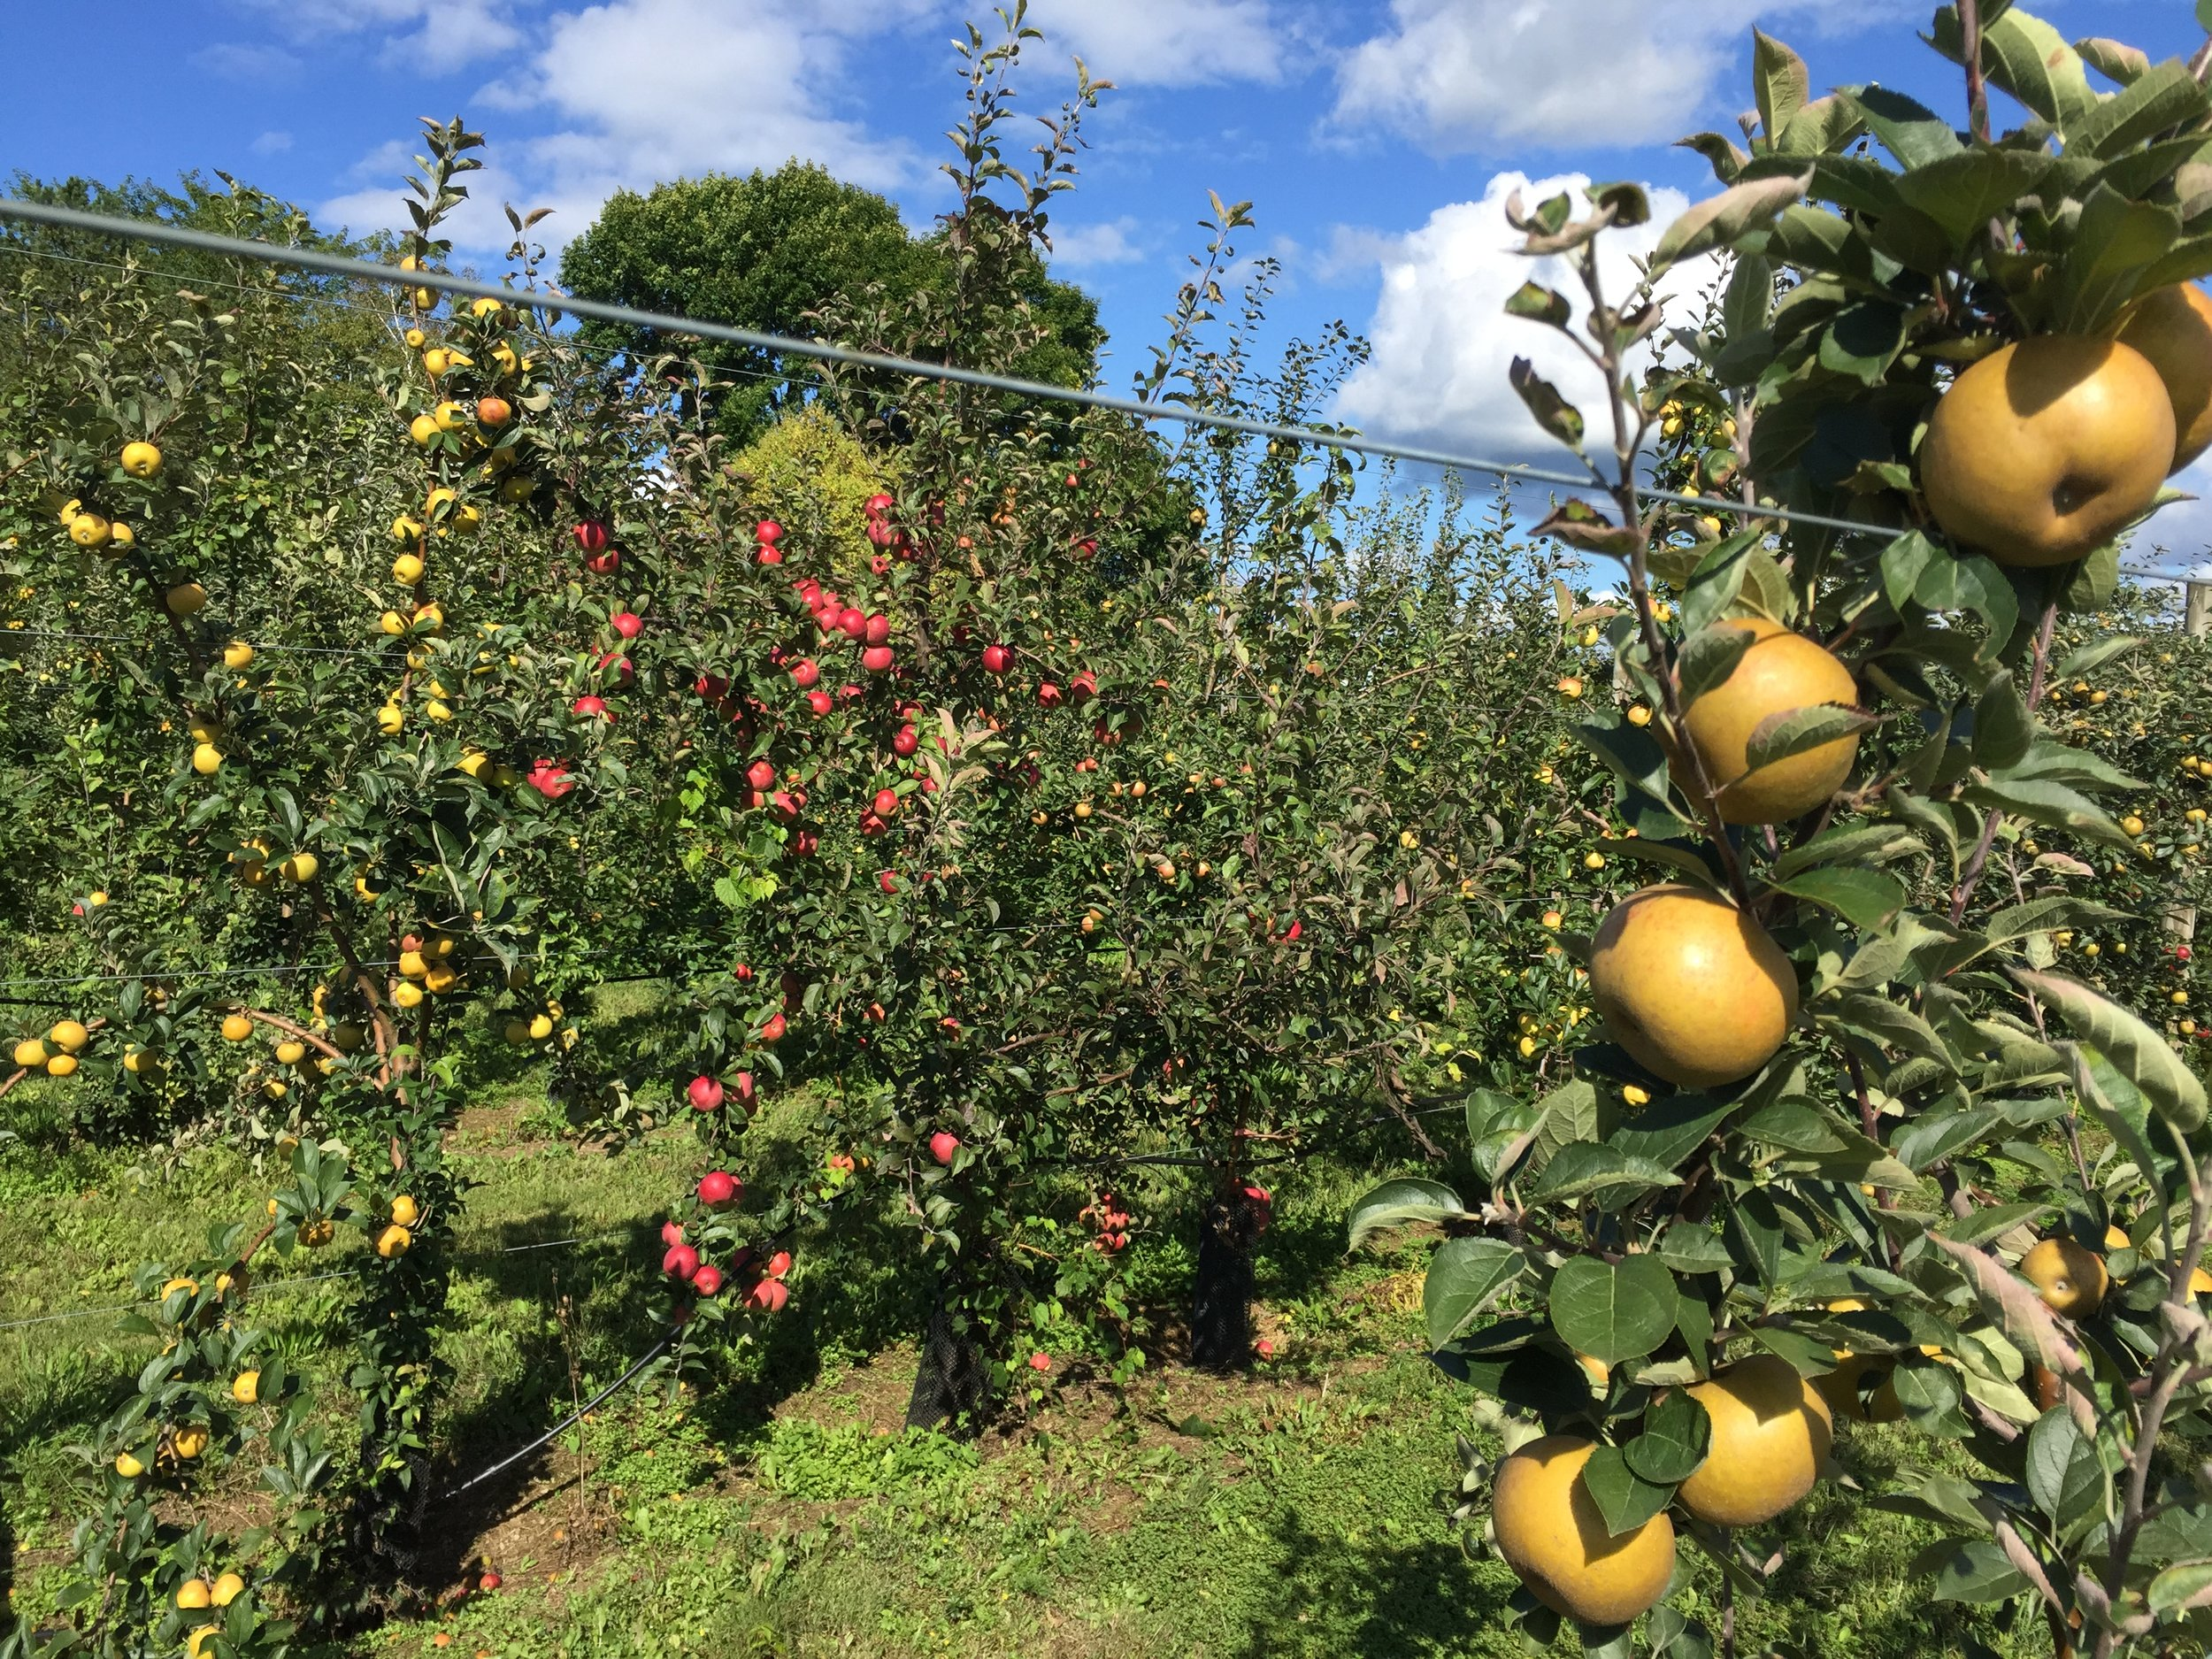 Hudson Valley Apple Project - September